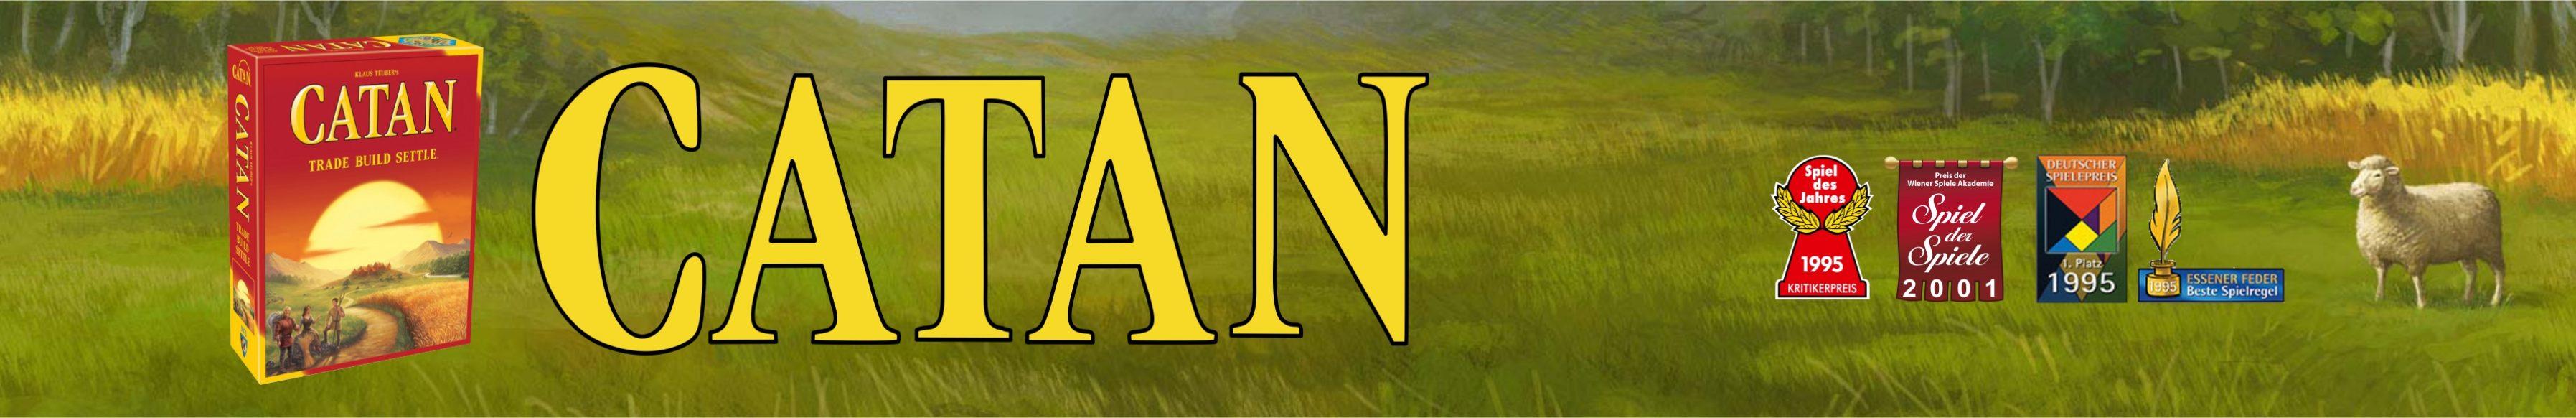 03-CATAN